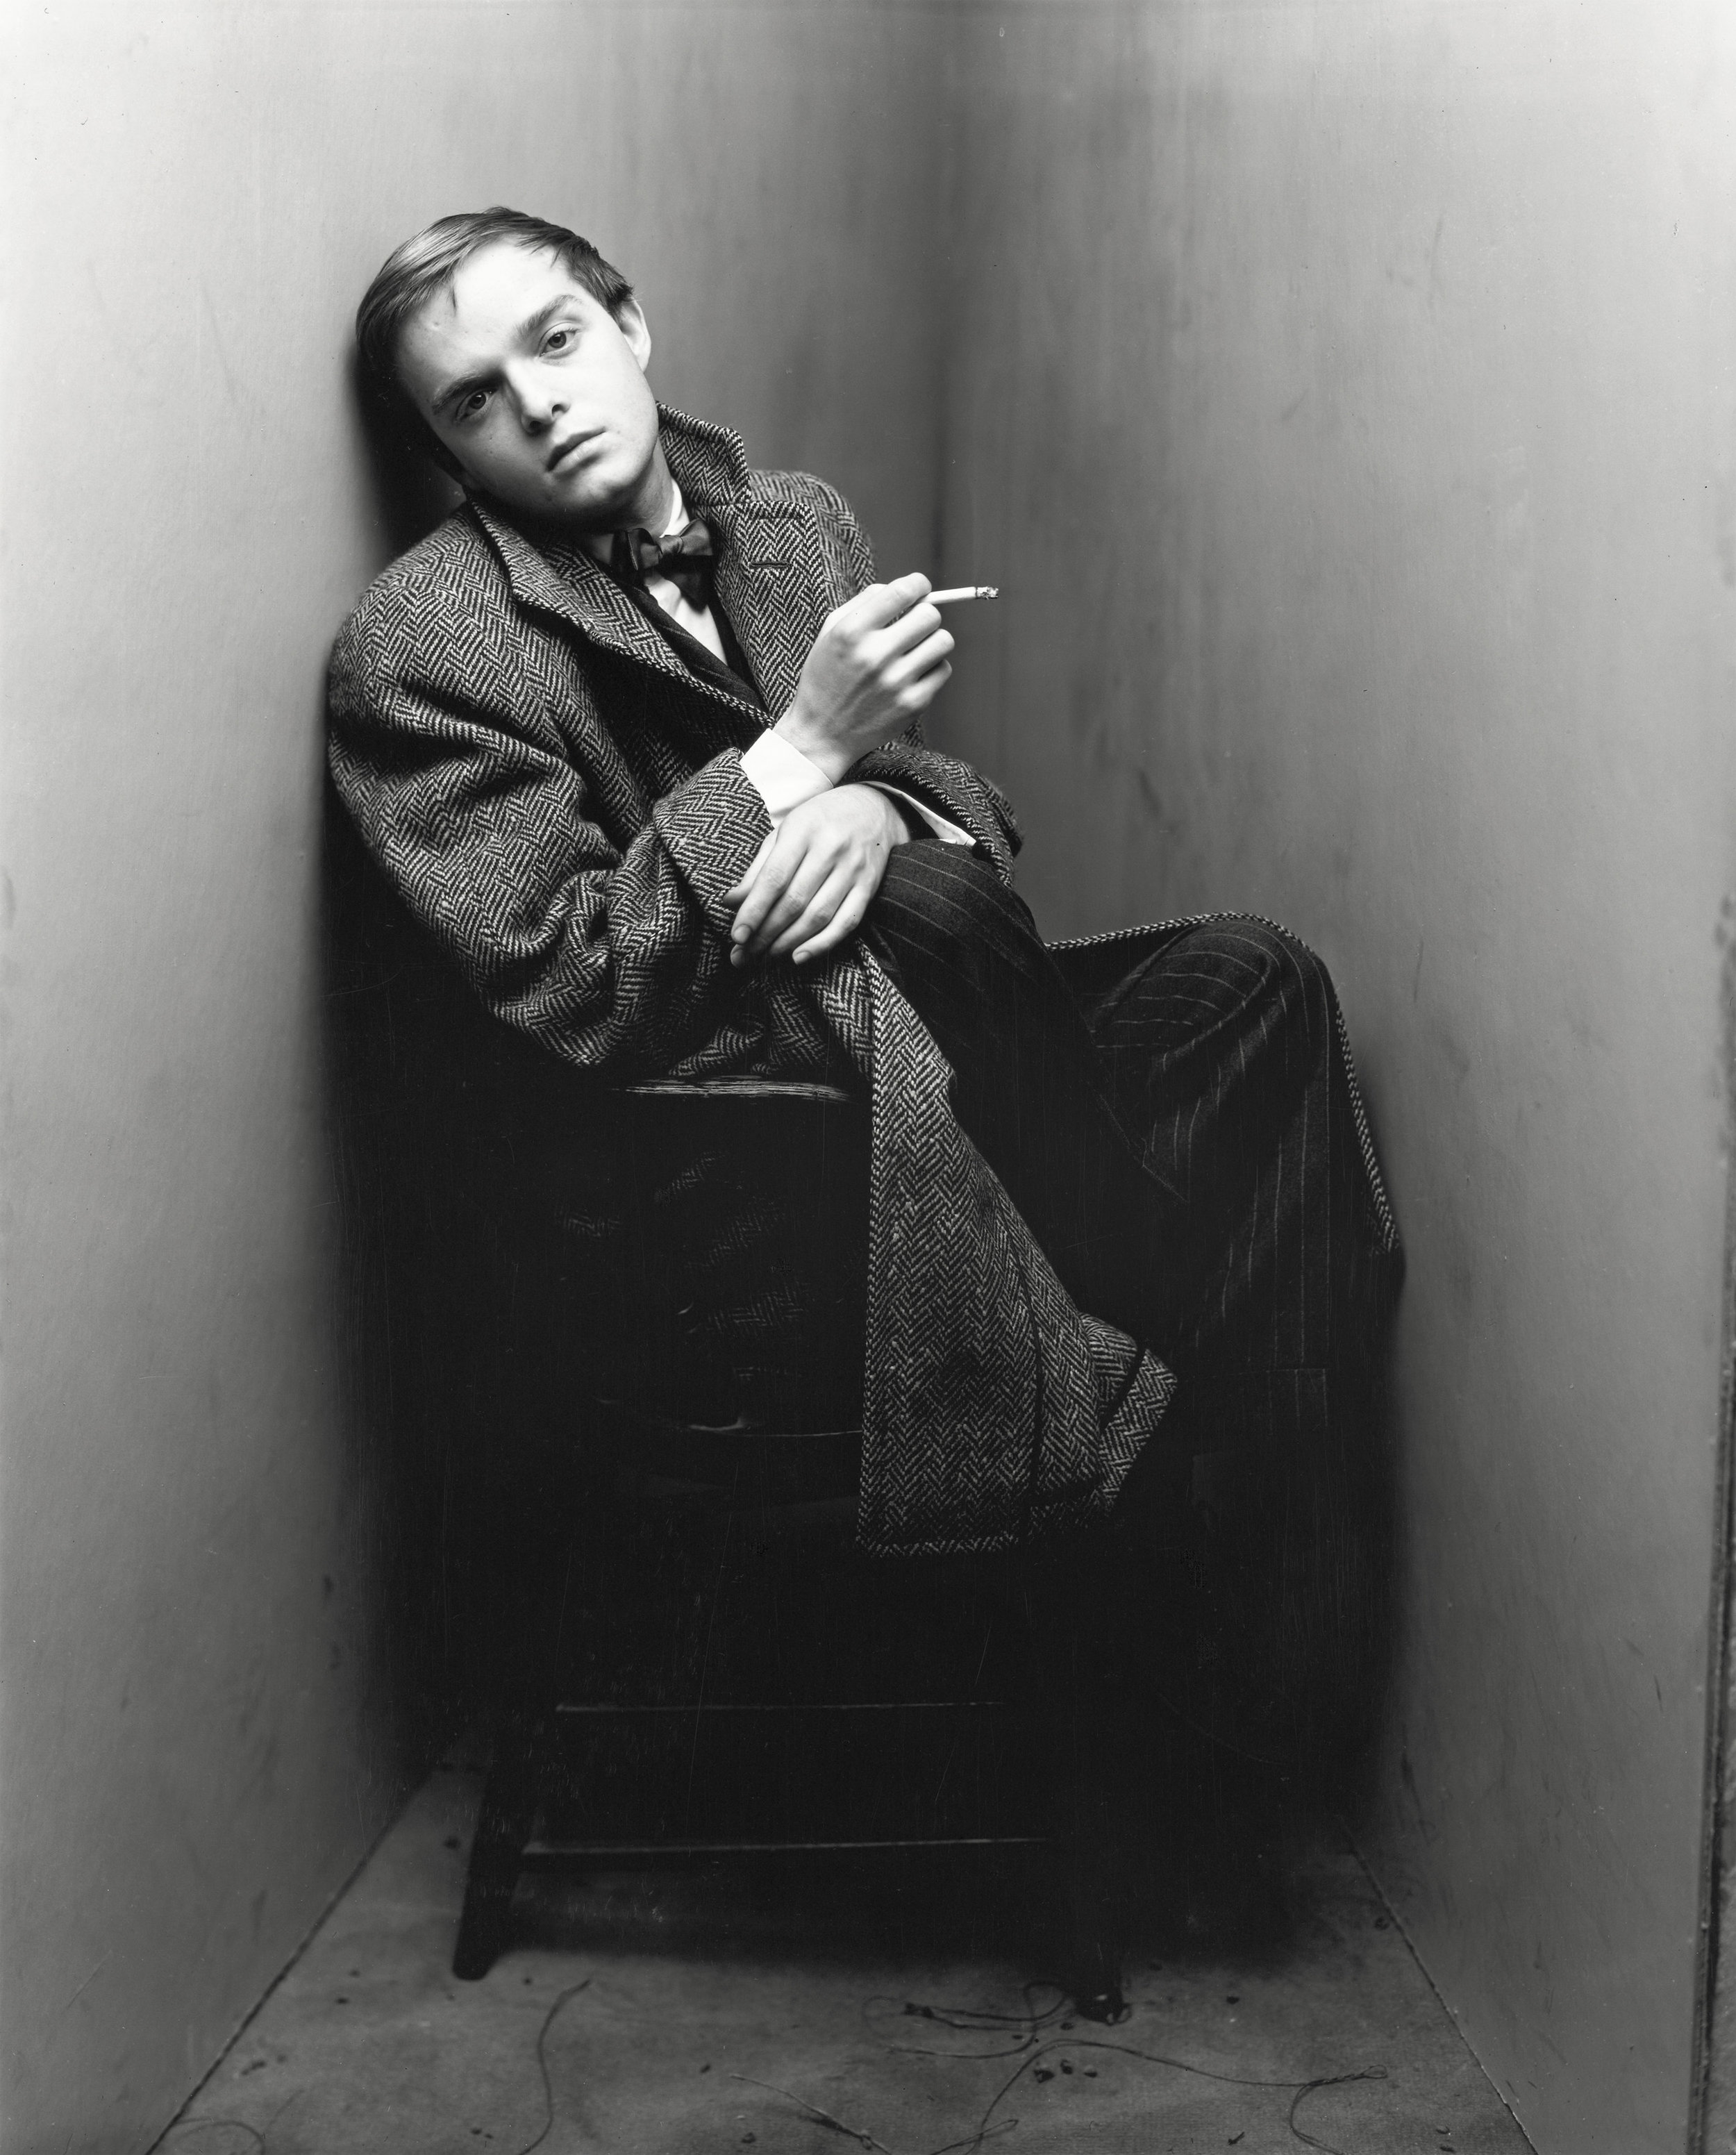 Irving Penn (American, 1917–2009)    Truman Capote , New York, 1948    Platinum-palladium print, 1968  15 7/8 × 15 3/8 in. (40.3 × 39.1 cm)  The Metropolitan Museum of Art, New York,  Purchase, The Horace W. Goldsmith  Foundation Gift, through Joyce and Robert Menschel, 1986  © The Irving Penn Foundation